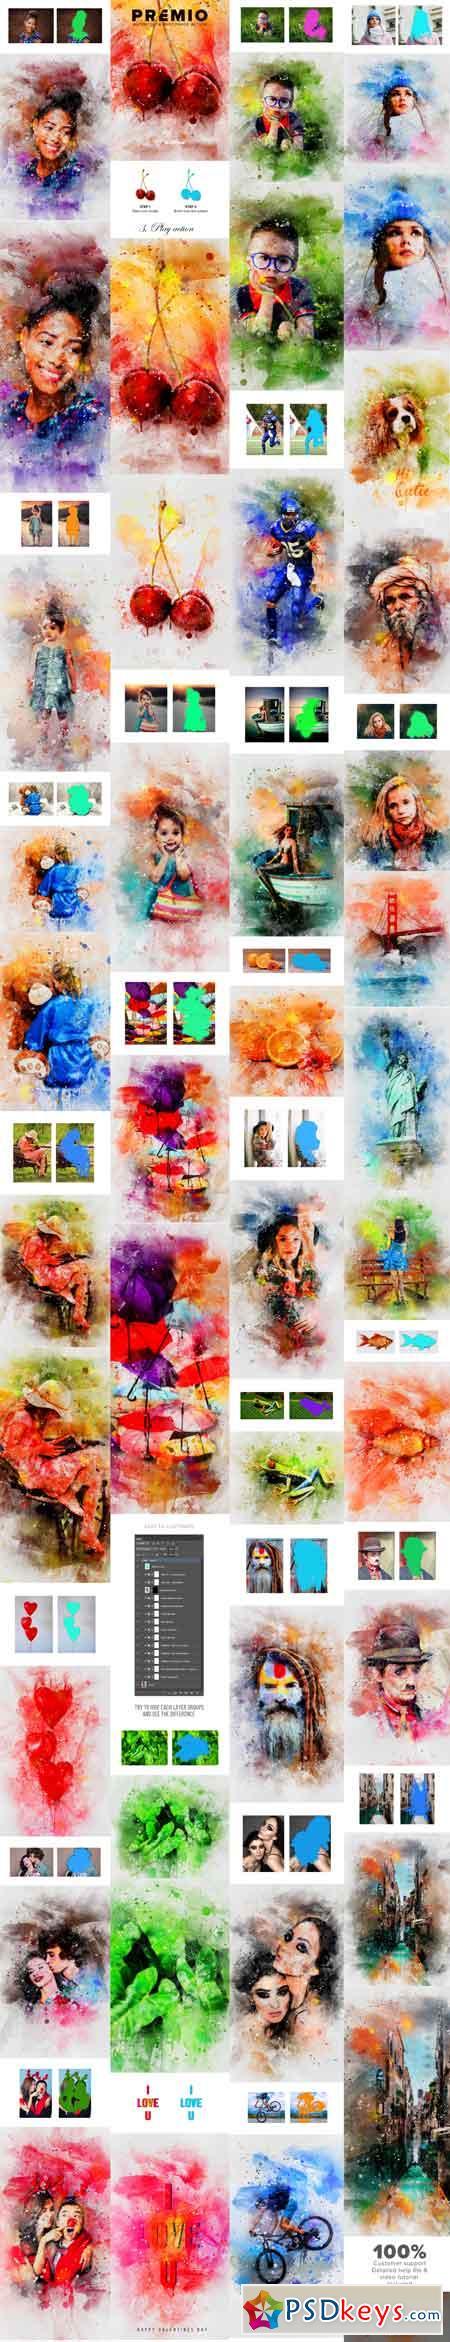 Premio Watercolor Photoshop Action 21337741